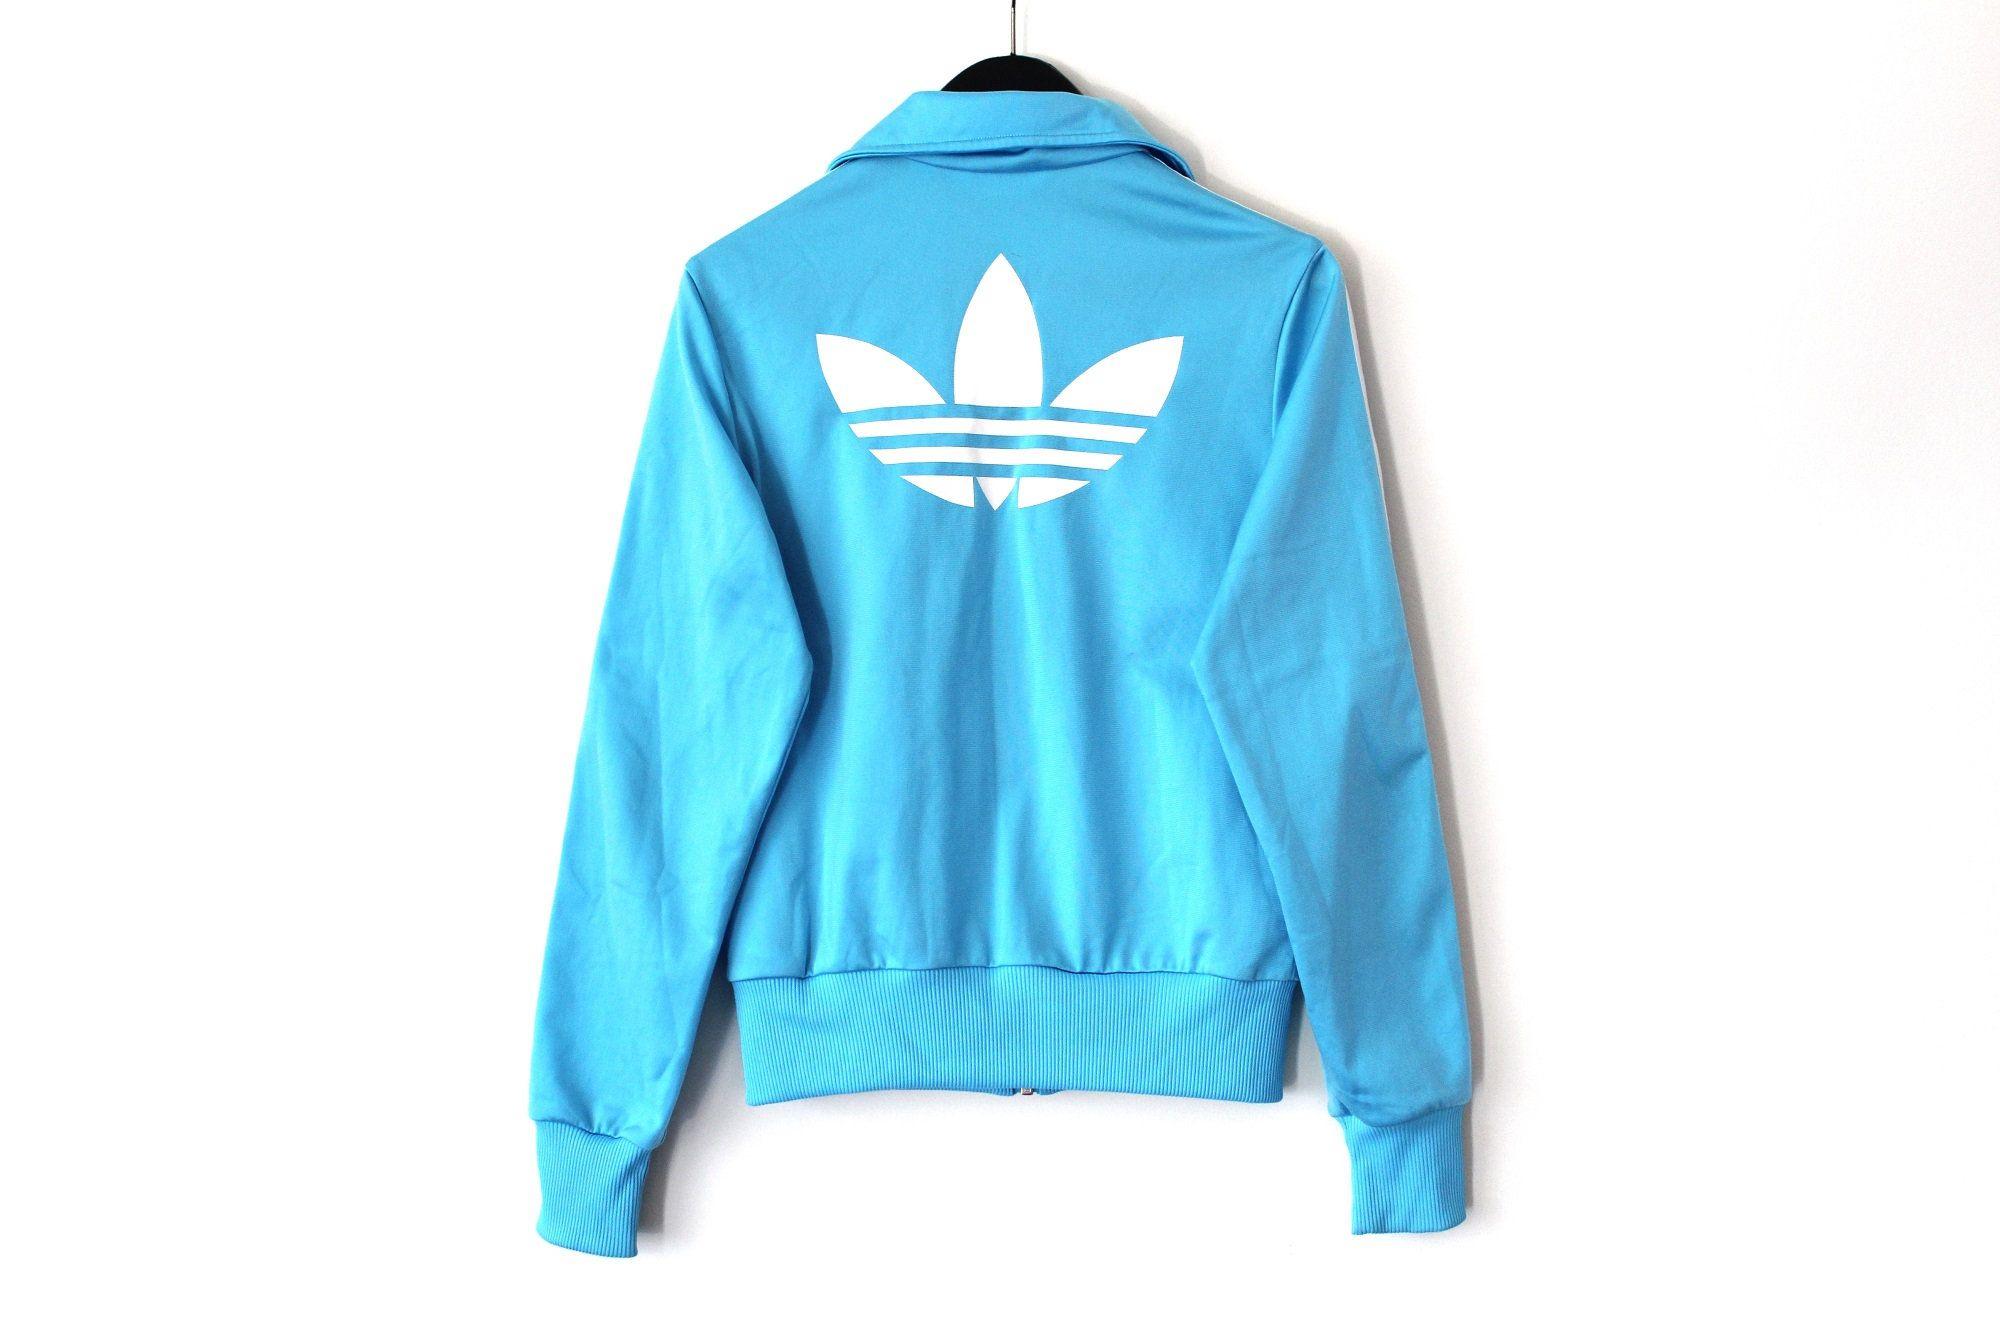 Blue White Vintage Adidas Jacket Retro Trefoil Windbreaker Tracksuit Rare Sweatshirt European Model Track Top Women S S Adidas Jacket Vintage Adidas Tracksuit [ 1333 x 2000 Pixel ]